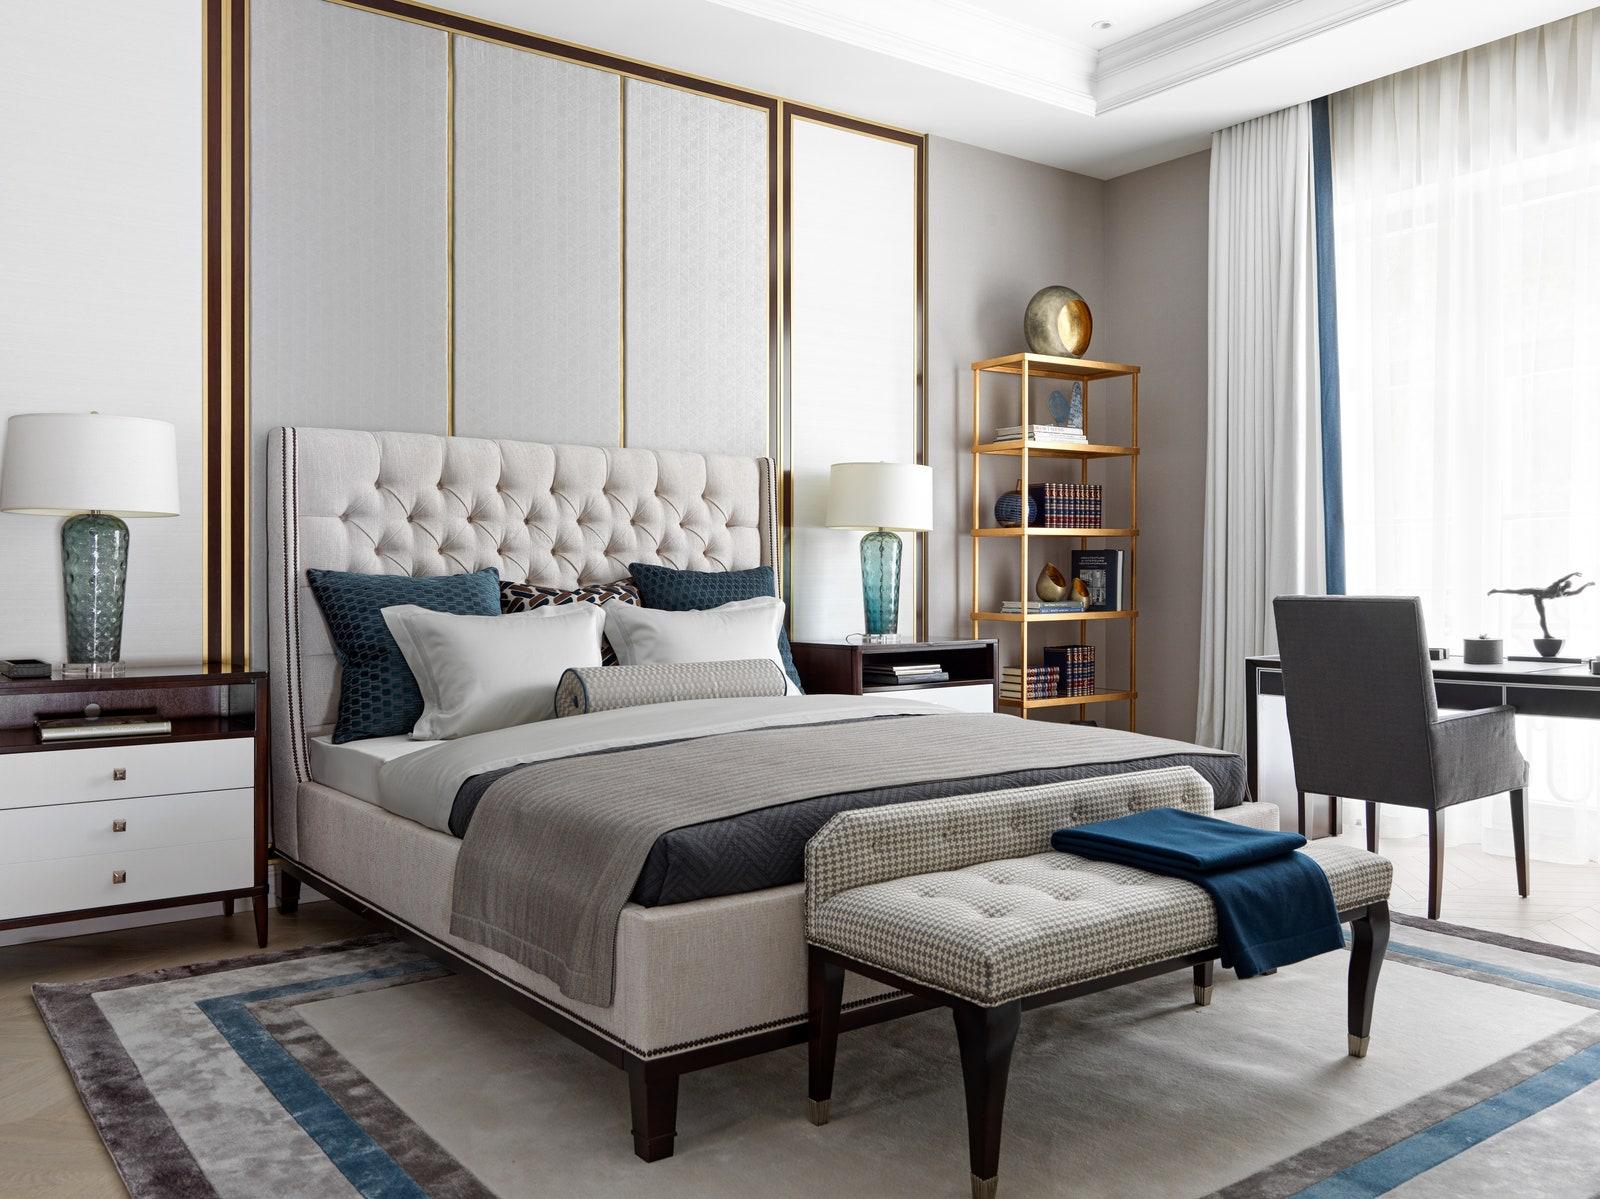 .    Highland House     Century Furniture  Currey amp Company   Atelier Tati  Art de Vivere    Pierre Frey  Dedar  Yana...